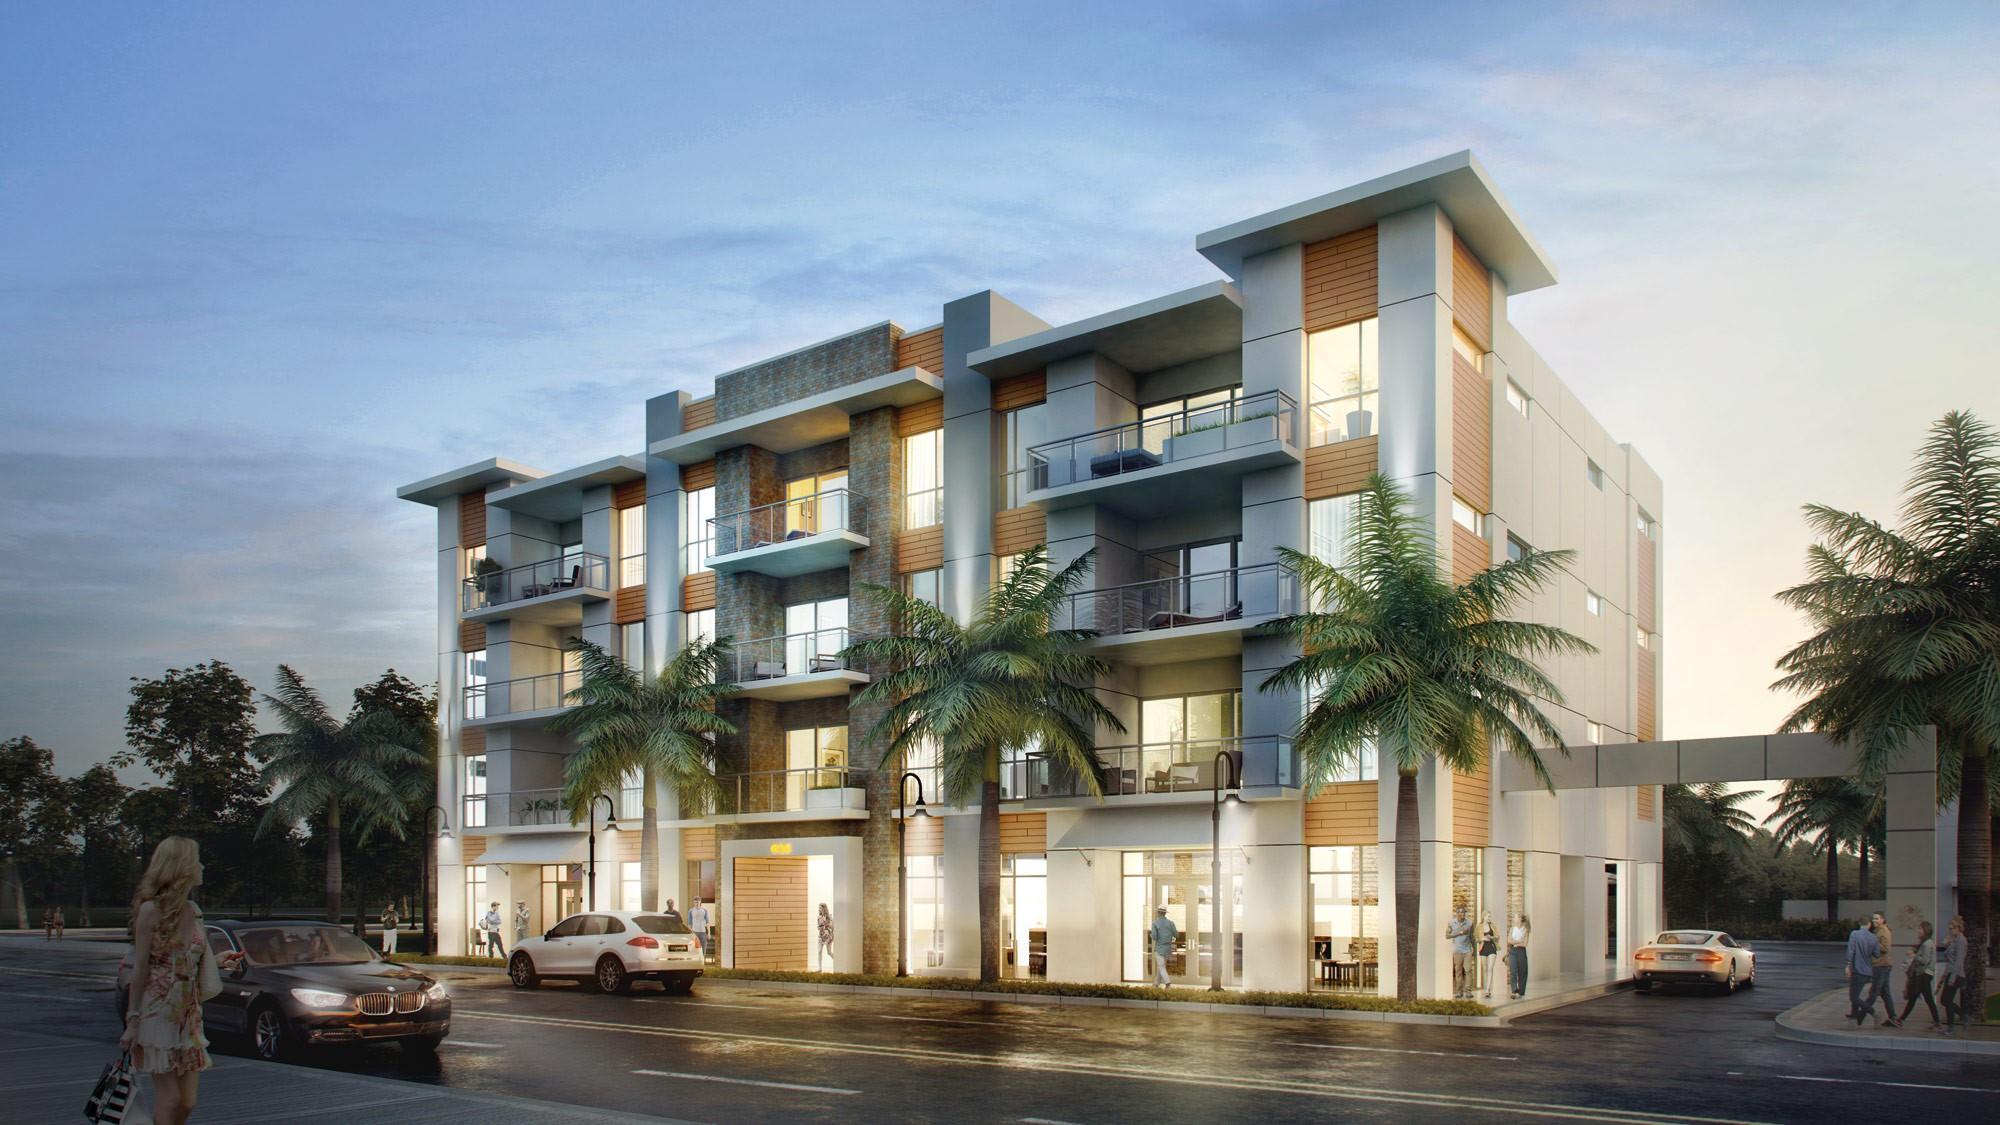 Lots / Land for Sale at 635 S Orange Ave Sarasota, Florida 34236 United States